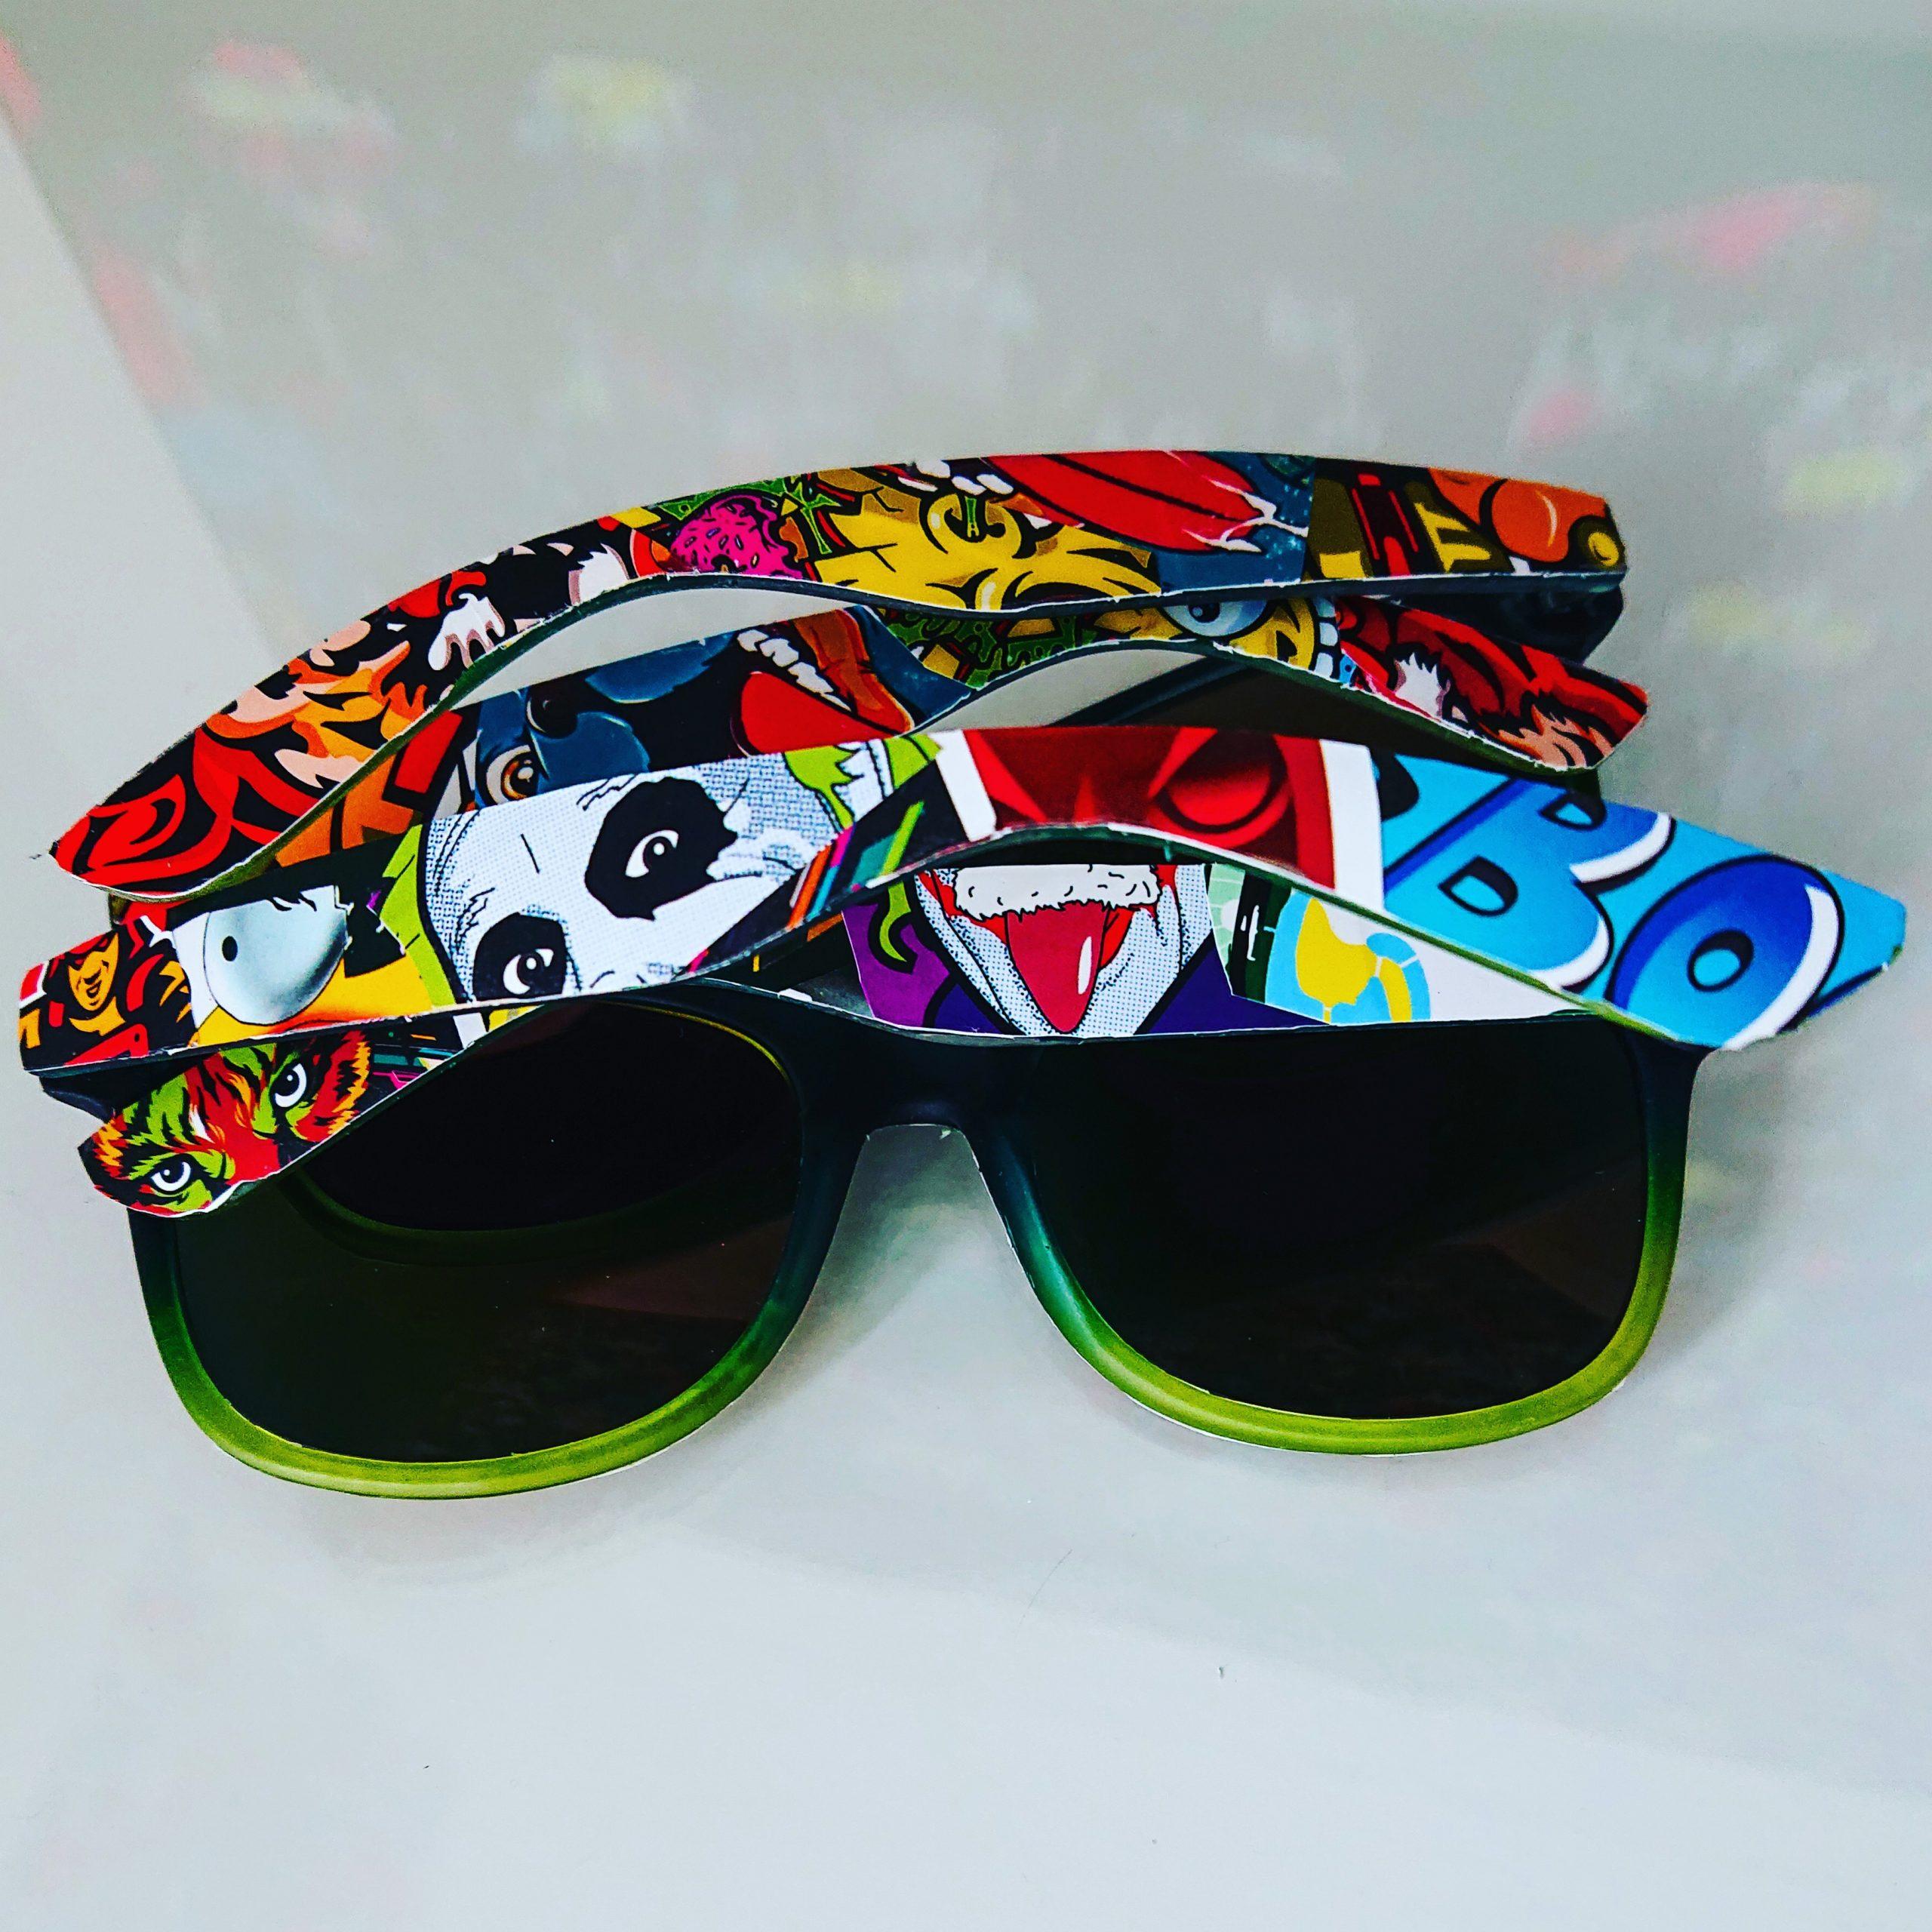 Sticker Bombing Sunglasses